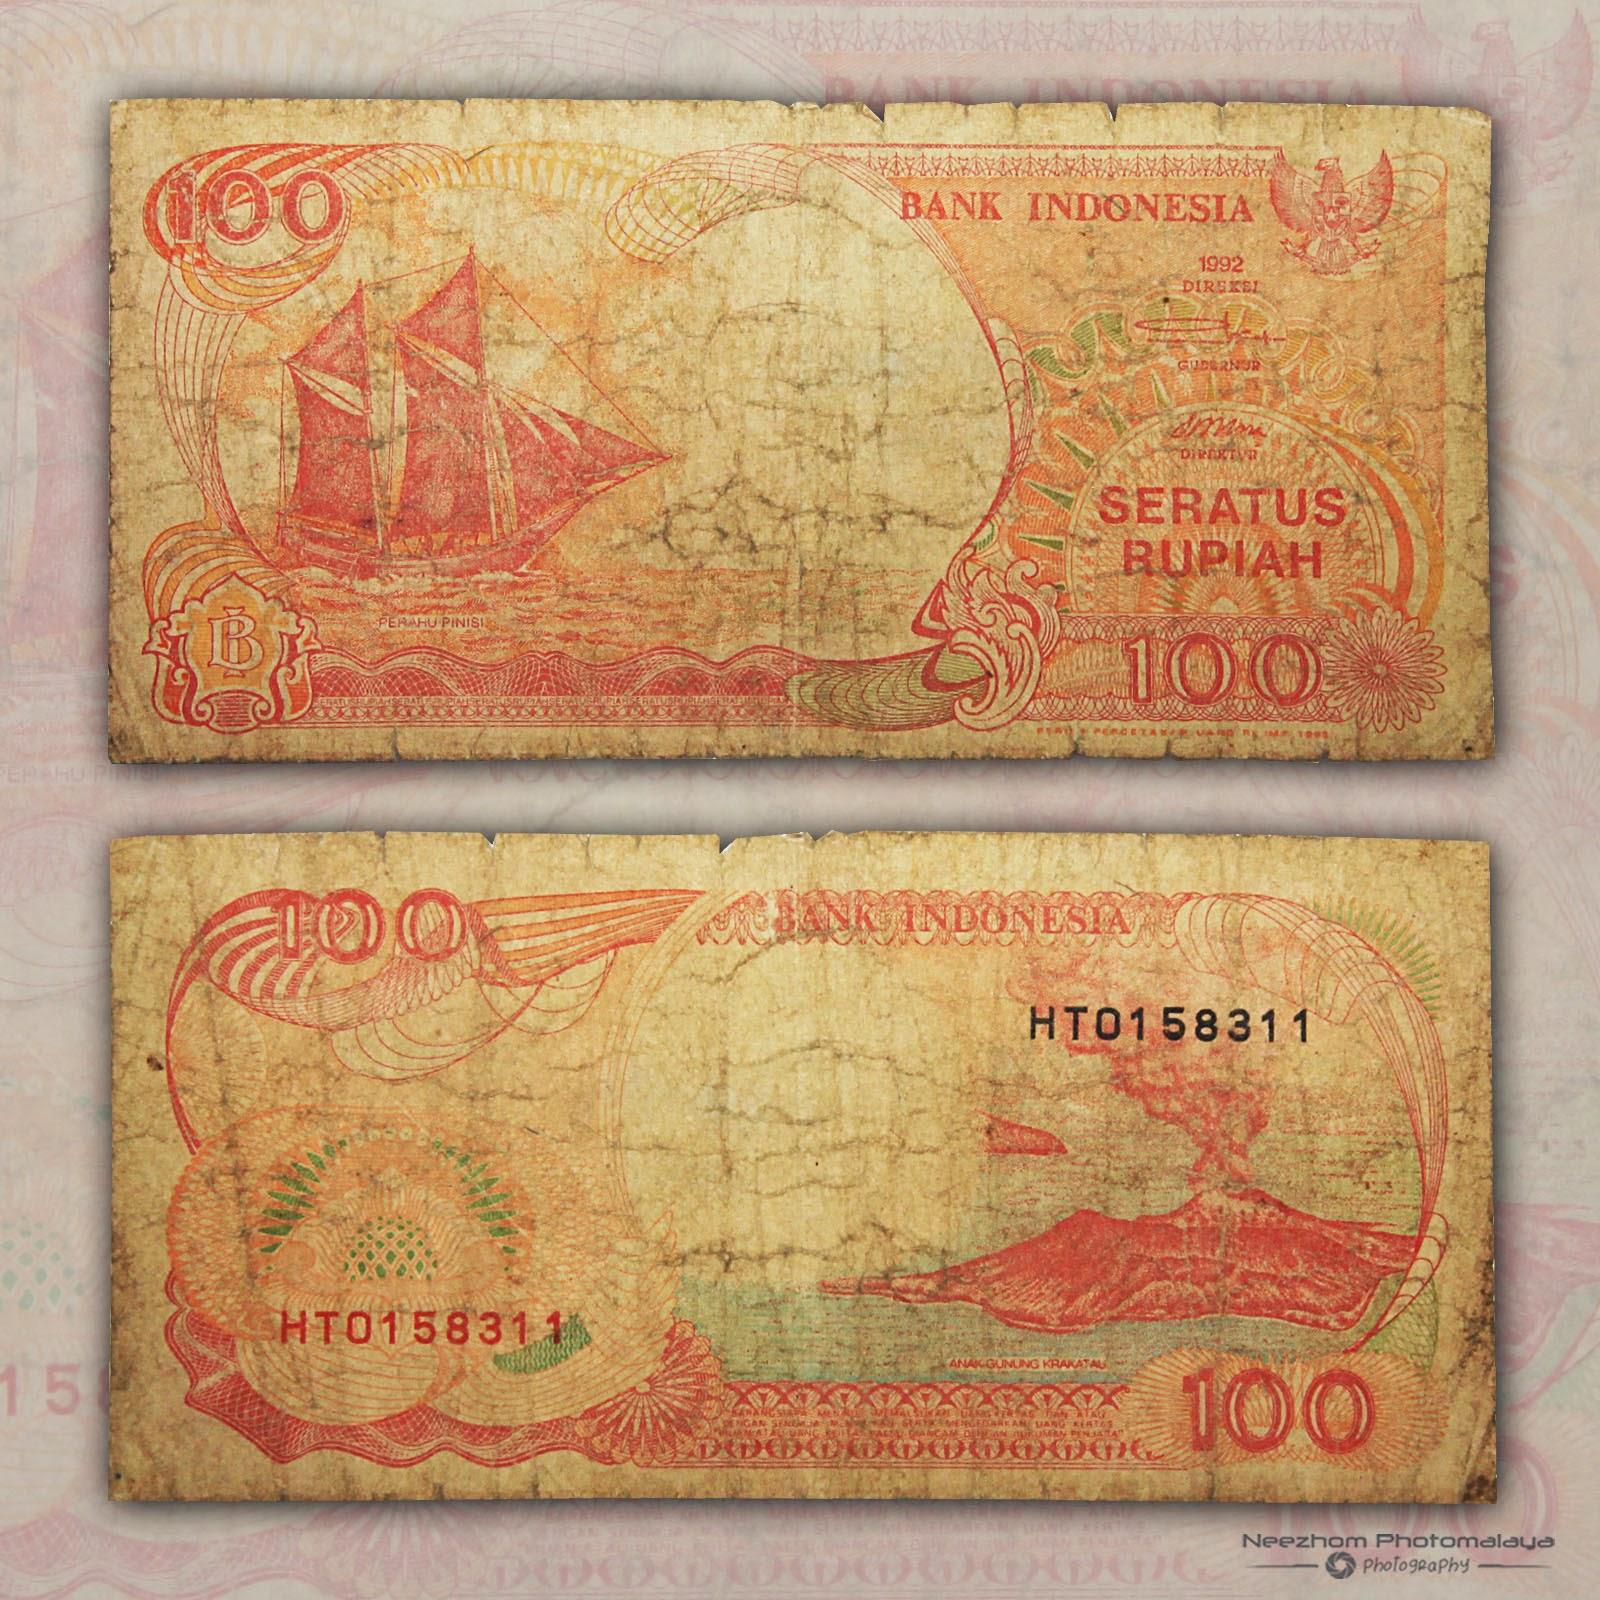 Wang kertas Indonesia 100 Rupiah tahun 1992